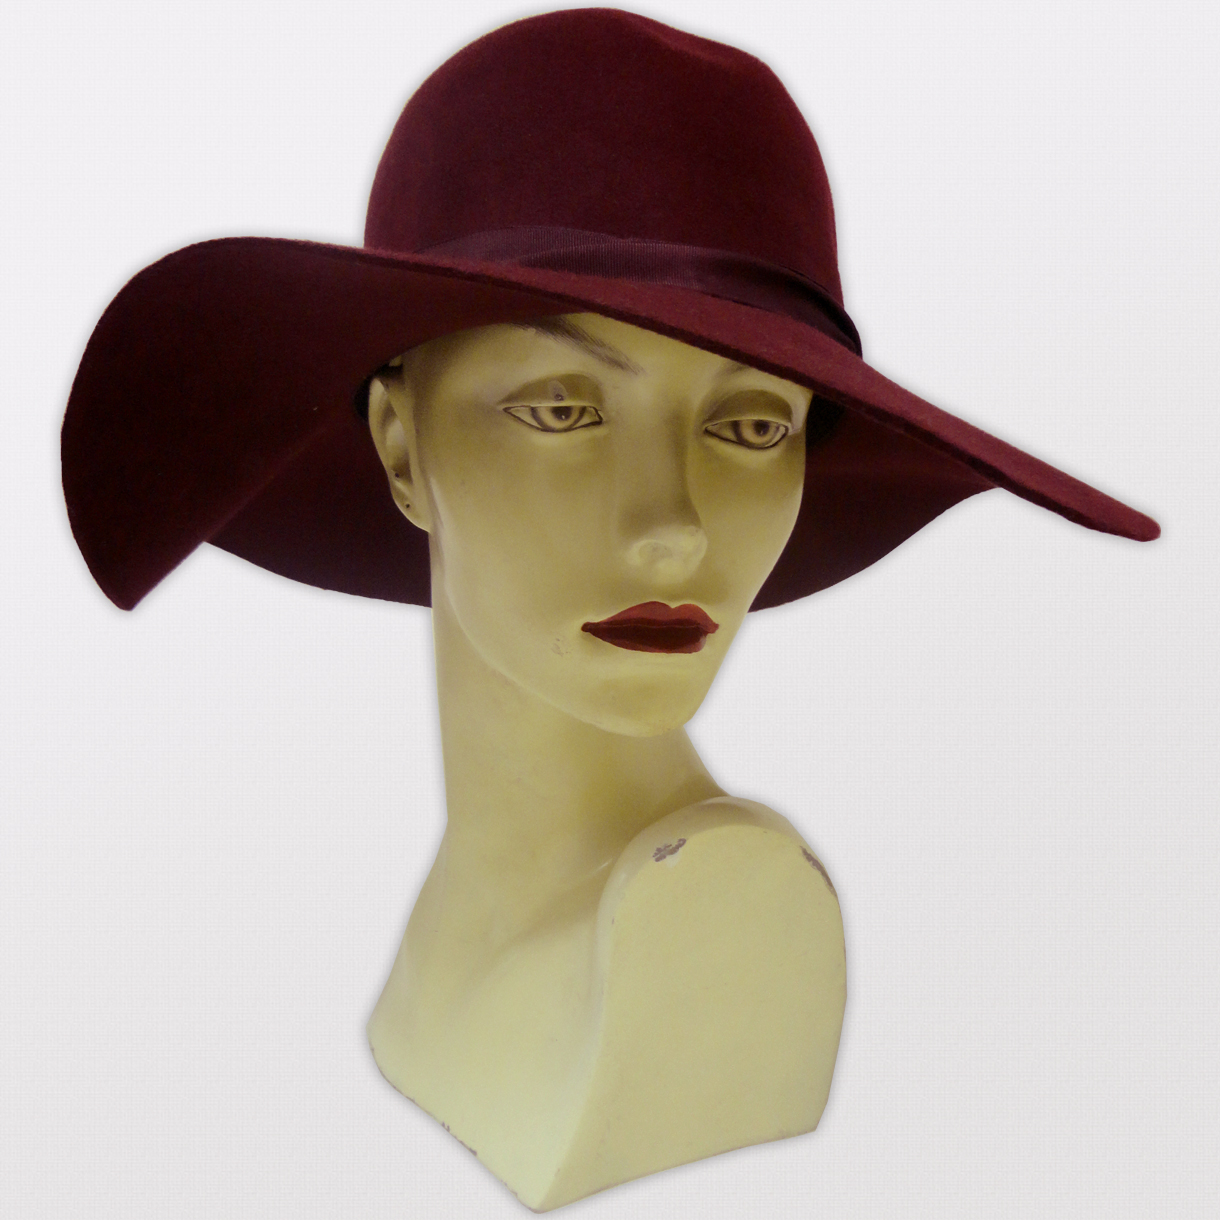 New Felt Hats Hit Beyond Retro Stores 208b9e1560a